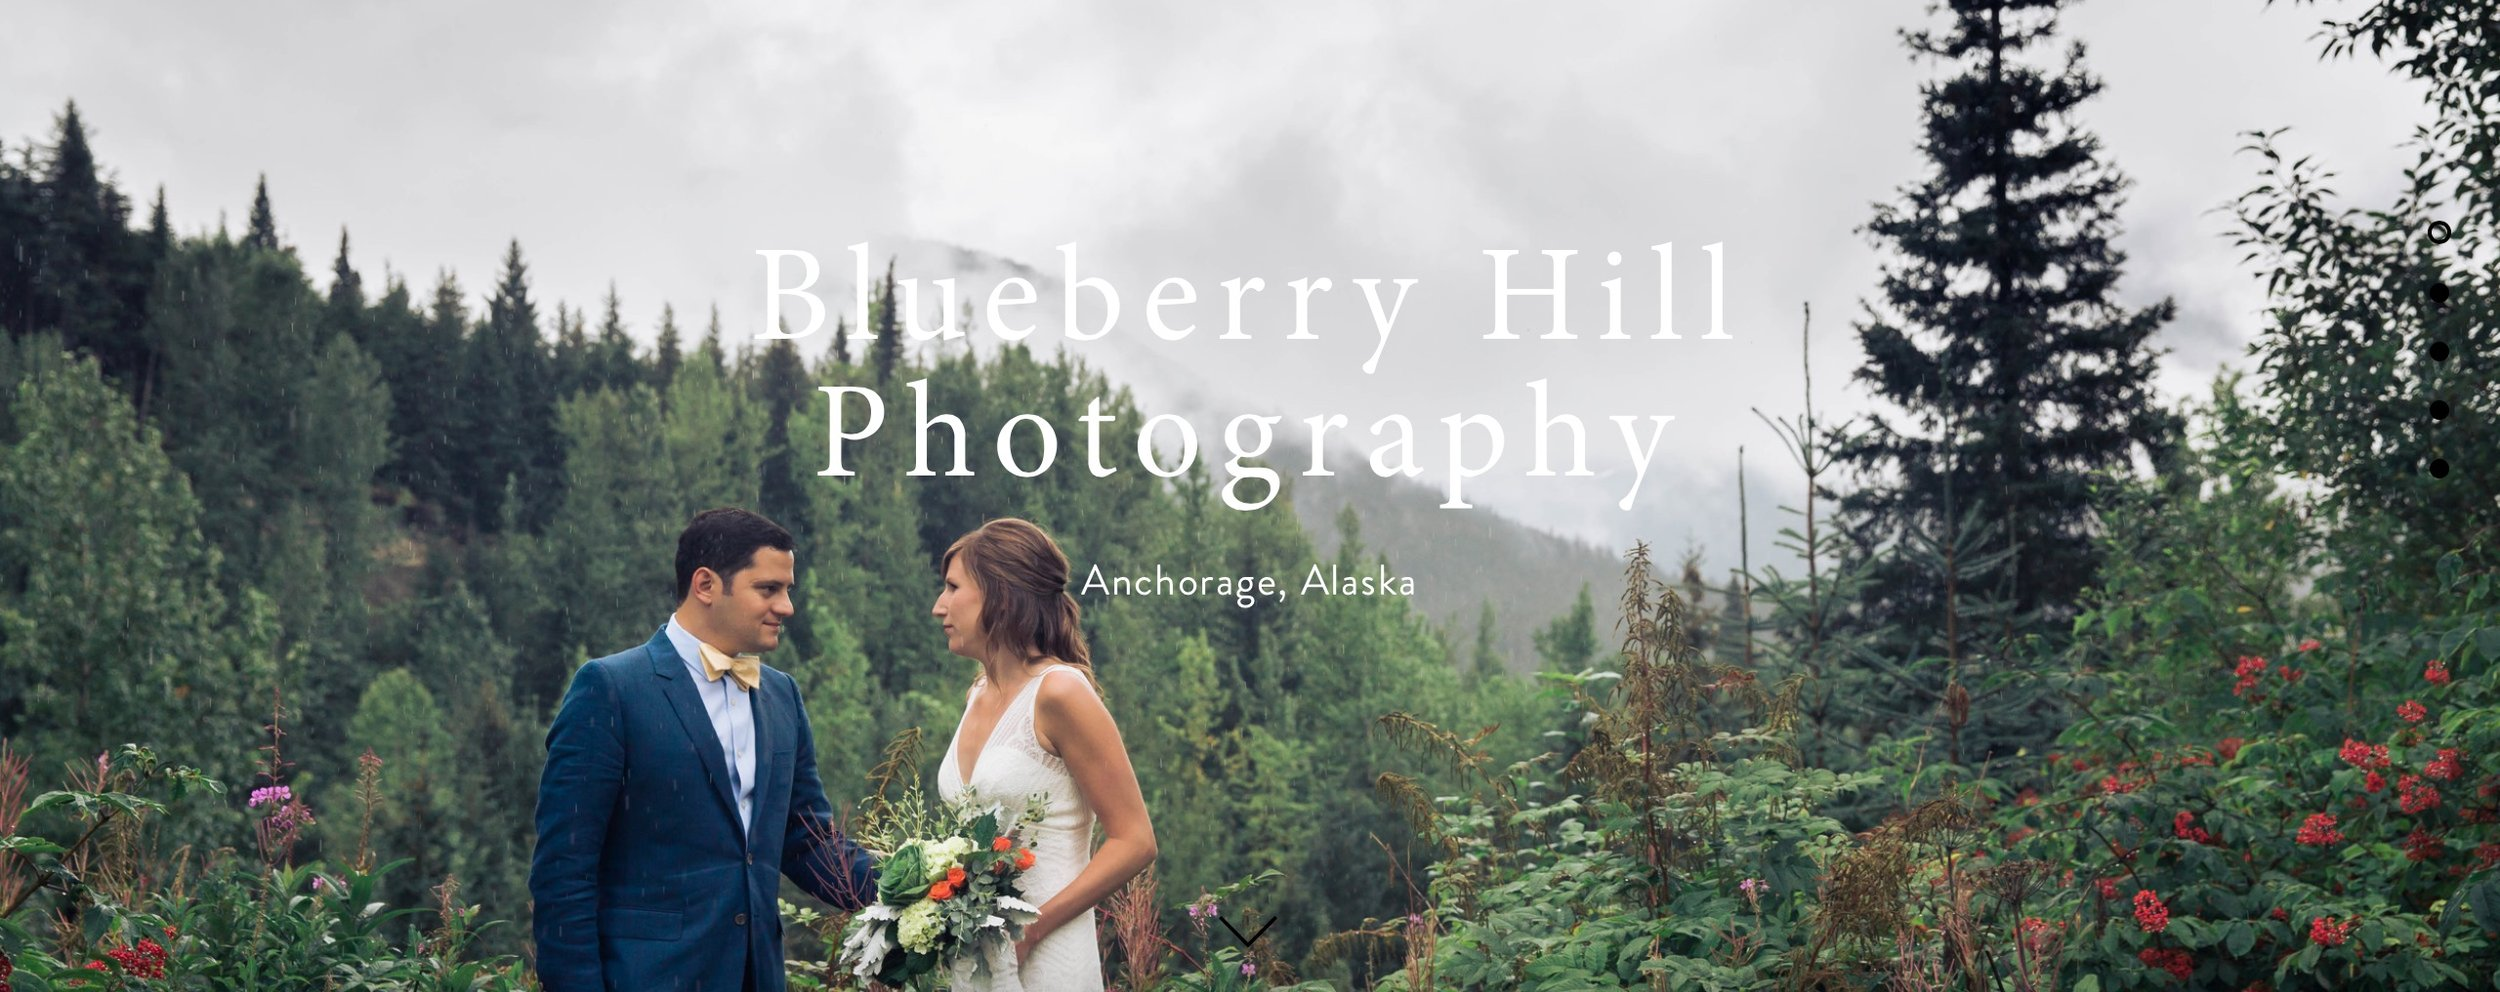 blueberry-hill-photography-crow-creek-wedding